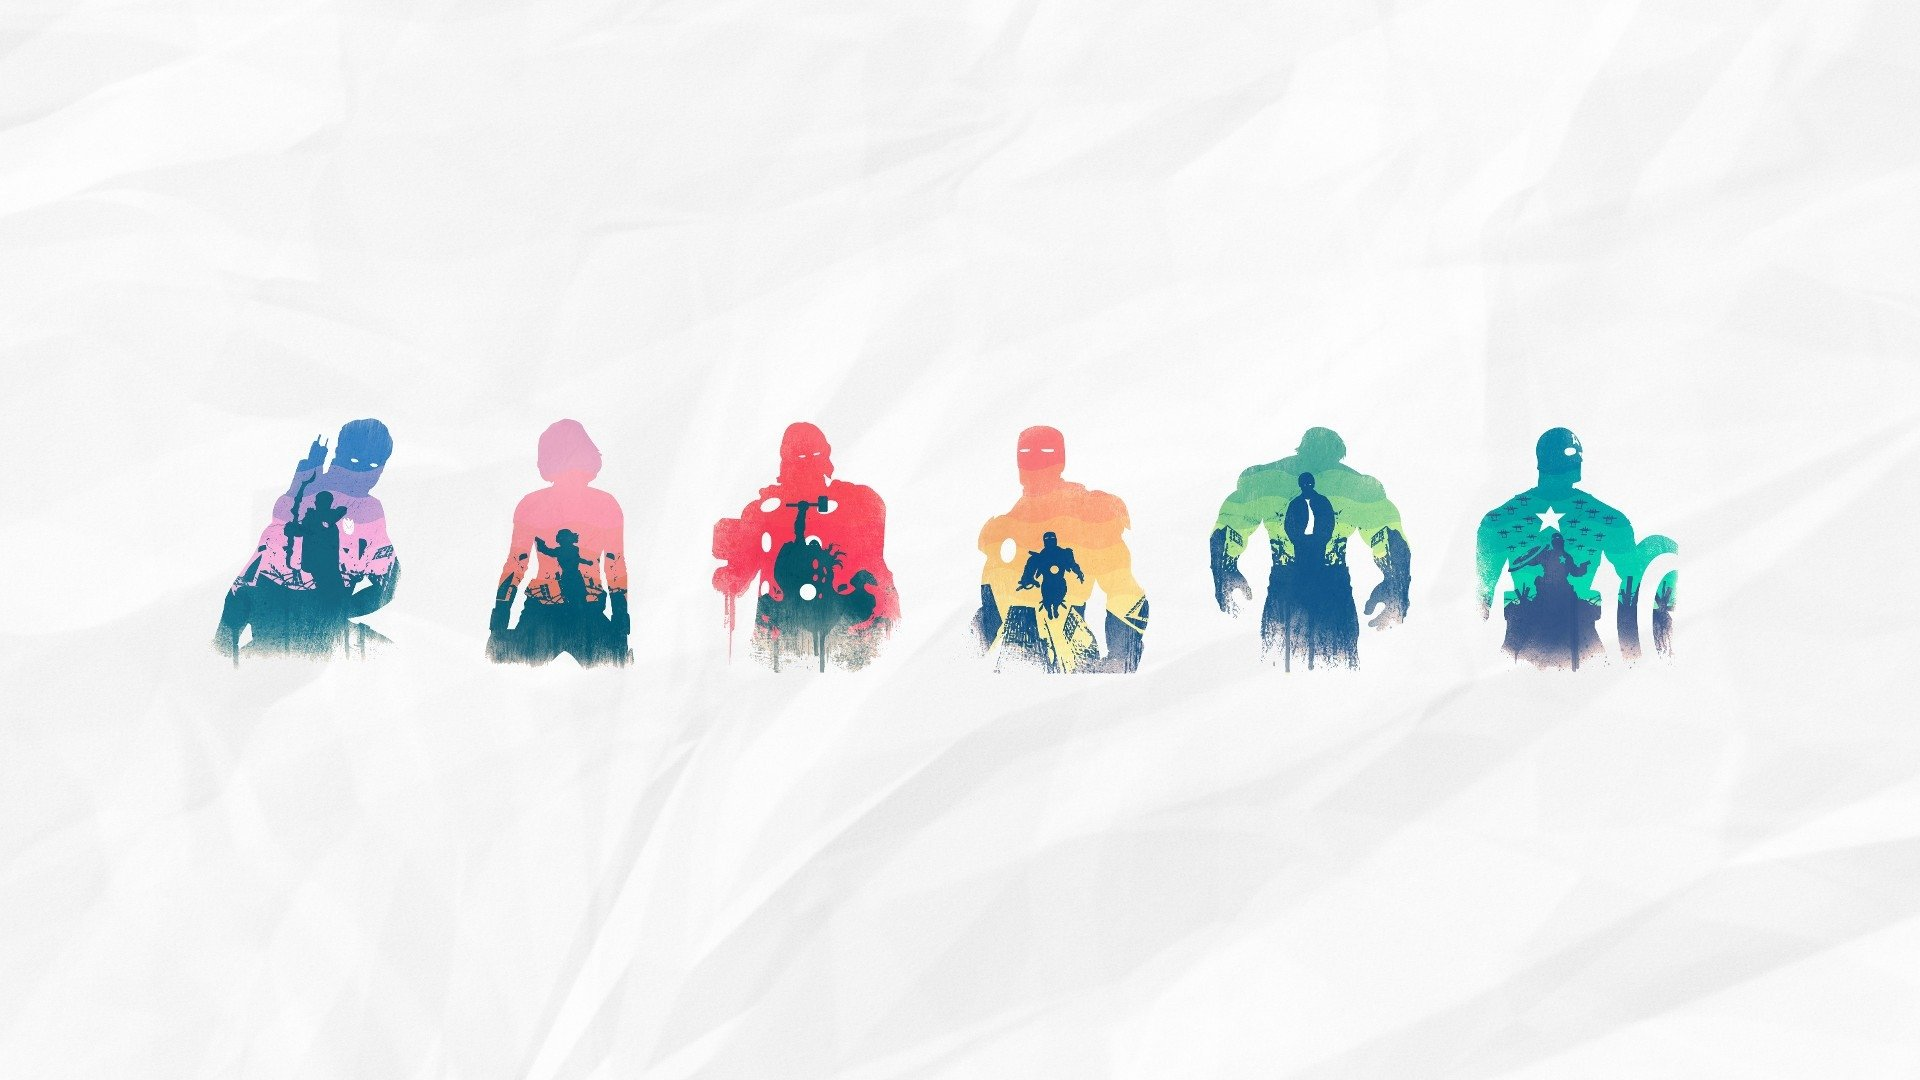 Hawkeye clint barton Wallpapers moreover Captain America Civil War Wallpaper 611021488 besides Thanos Wallpaper Hd moreover 817185 Ultimate Iron Man Wallpaper moreover Thor Wallpapers For Pc. on thor avengers widescreen wallpapers